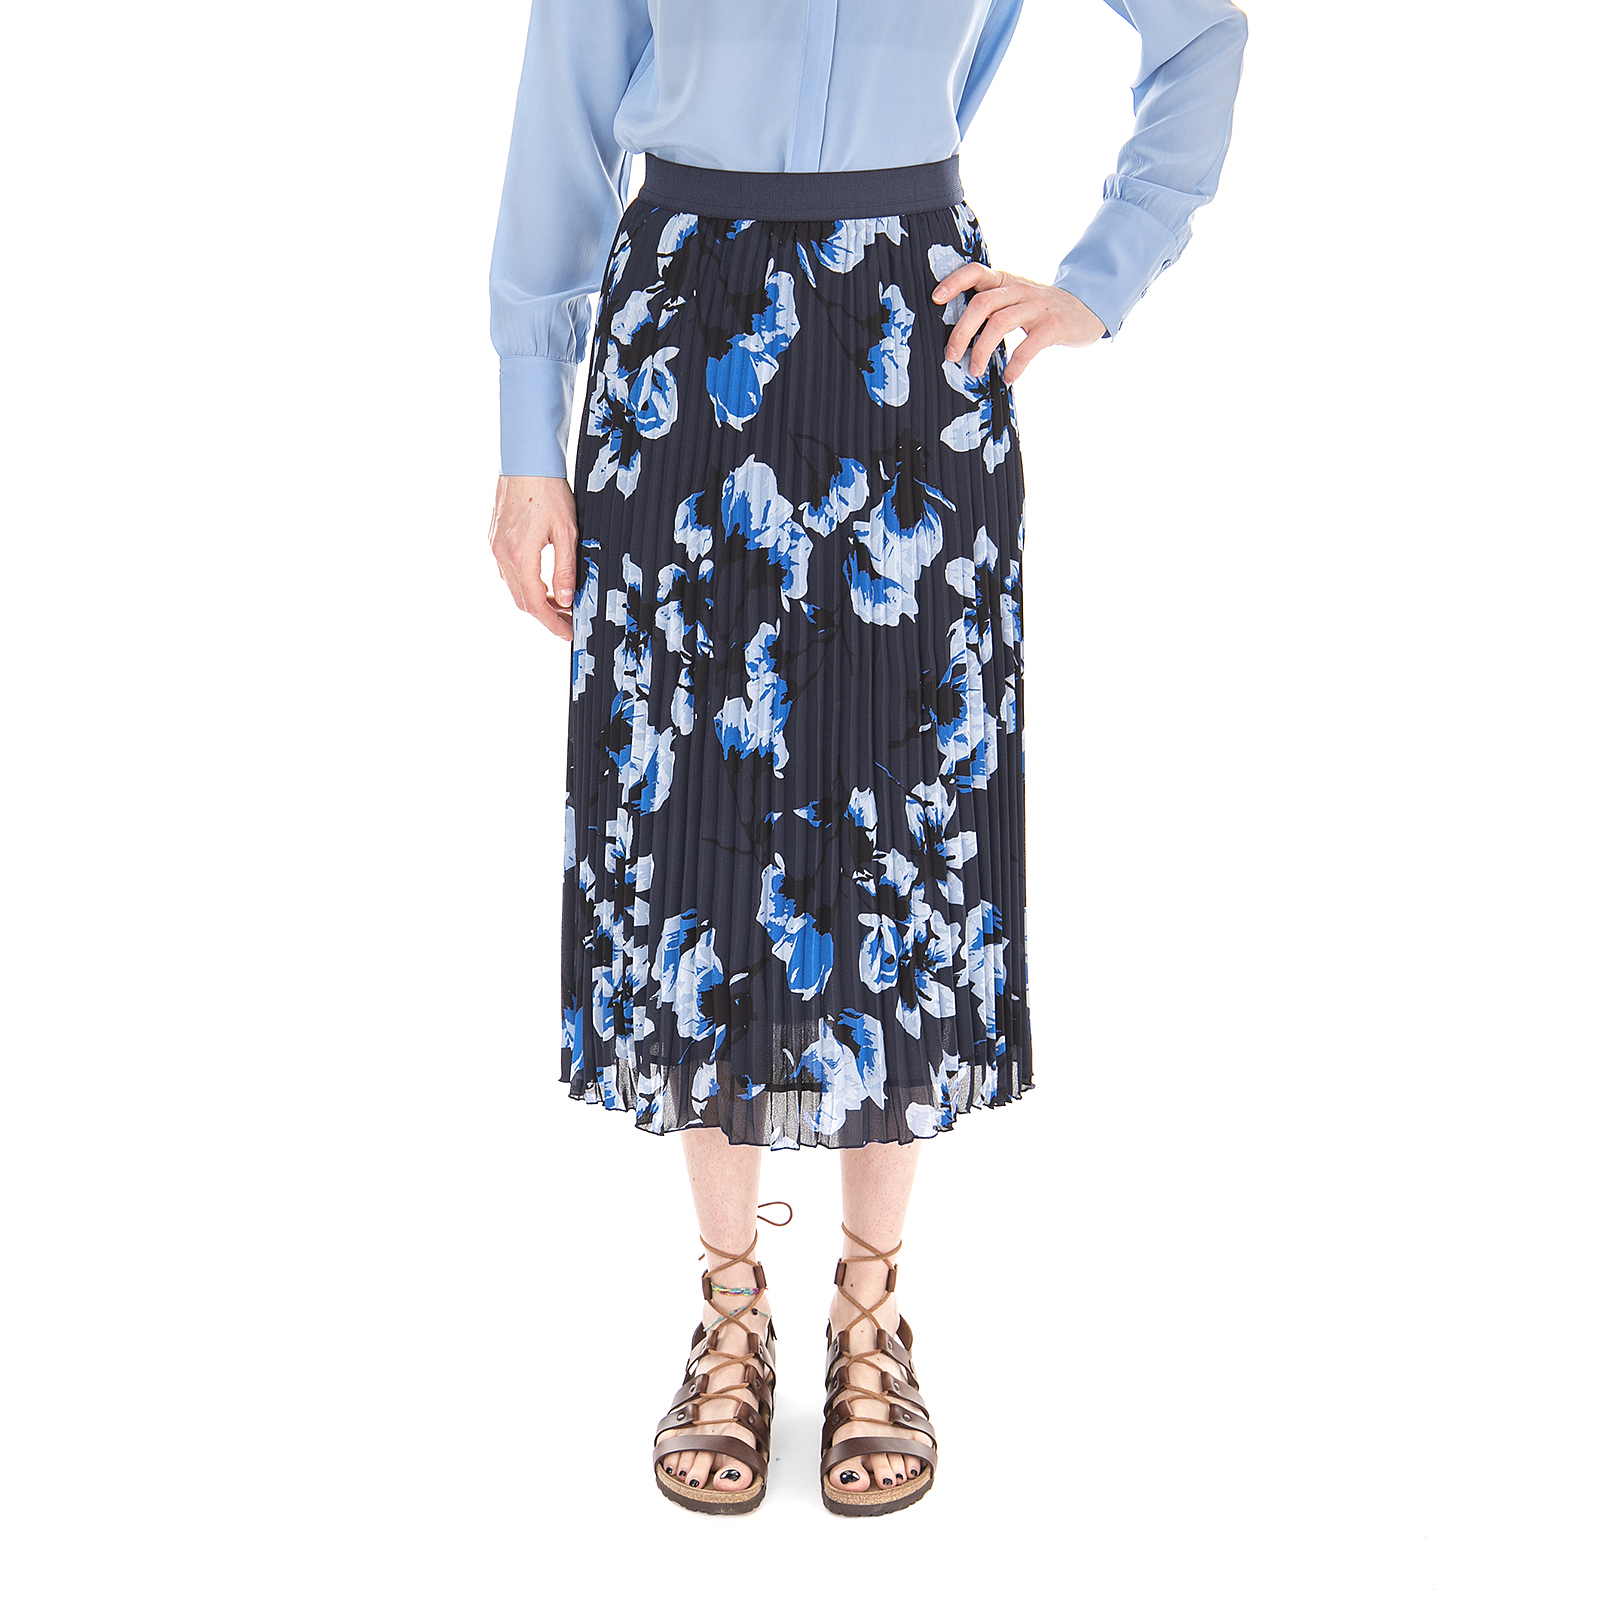 Minimum Gonne Chloe 0098 Dress blu blu